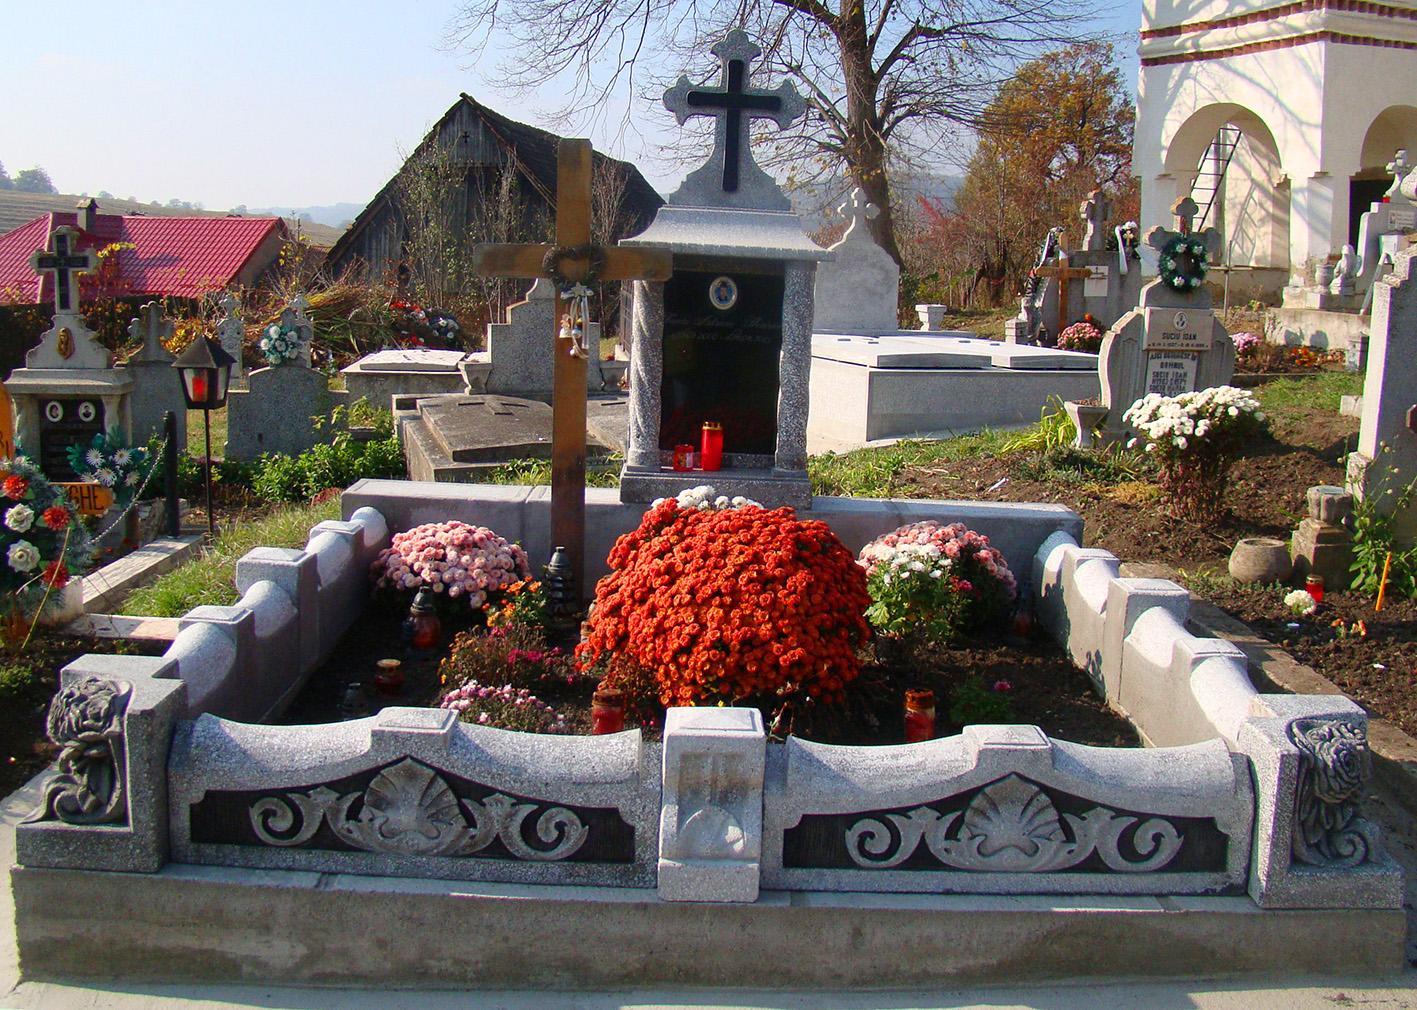 Bărbat găsit spânzurat de o cruce, în cimitir